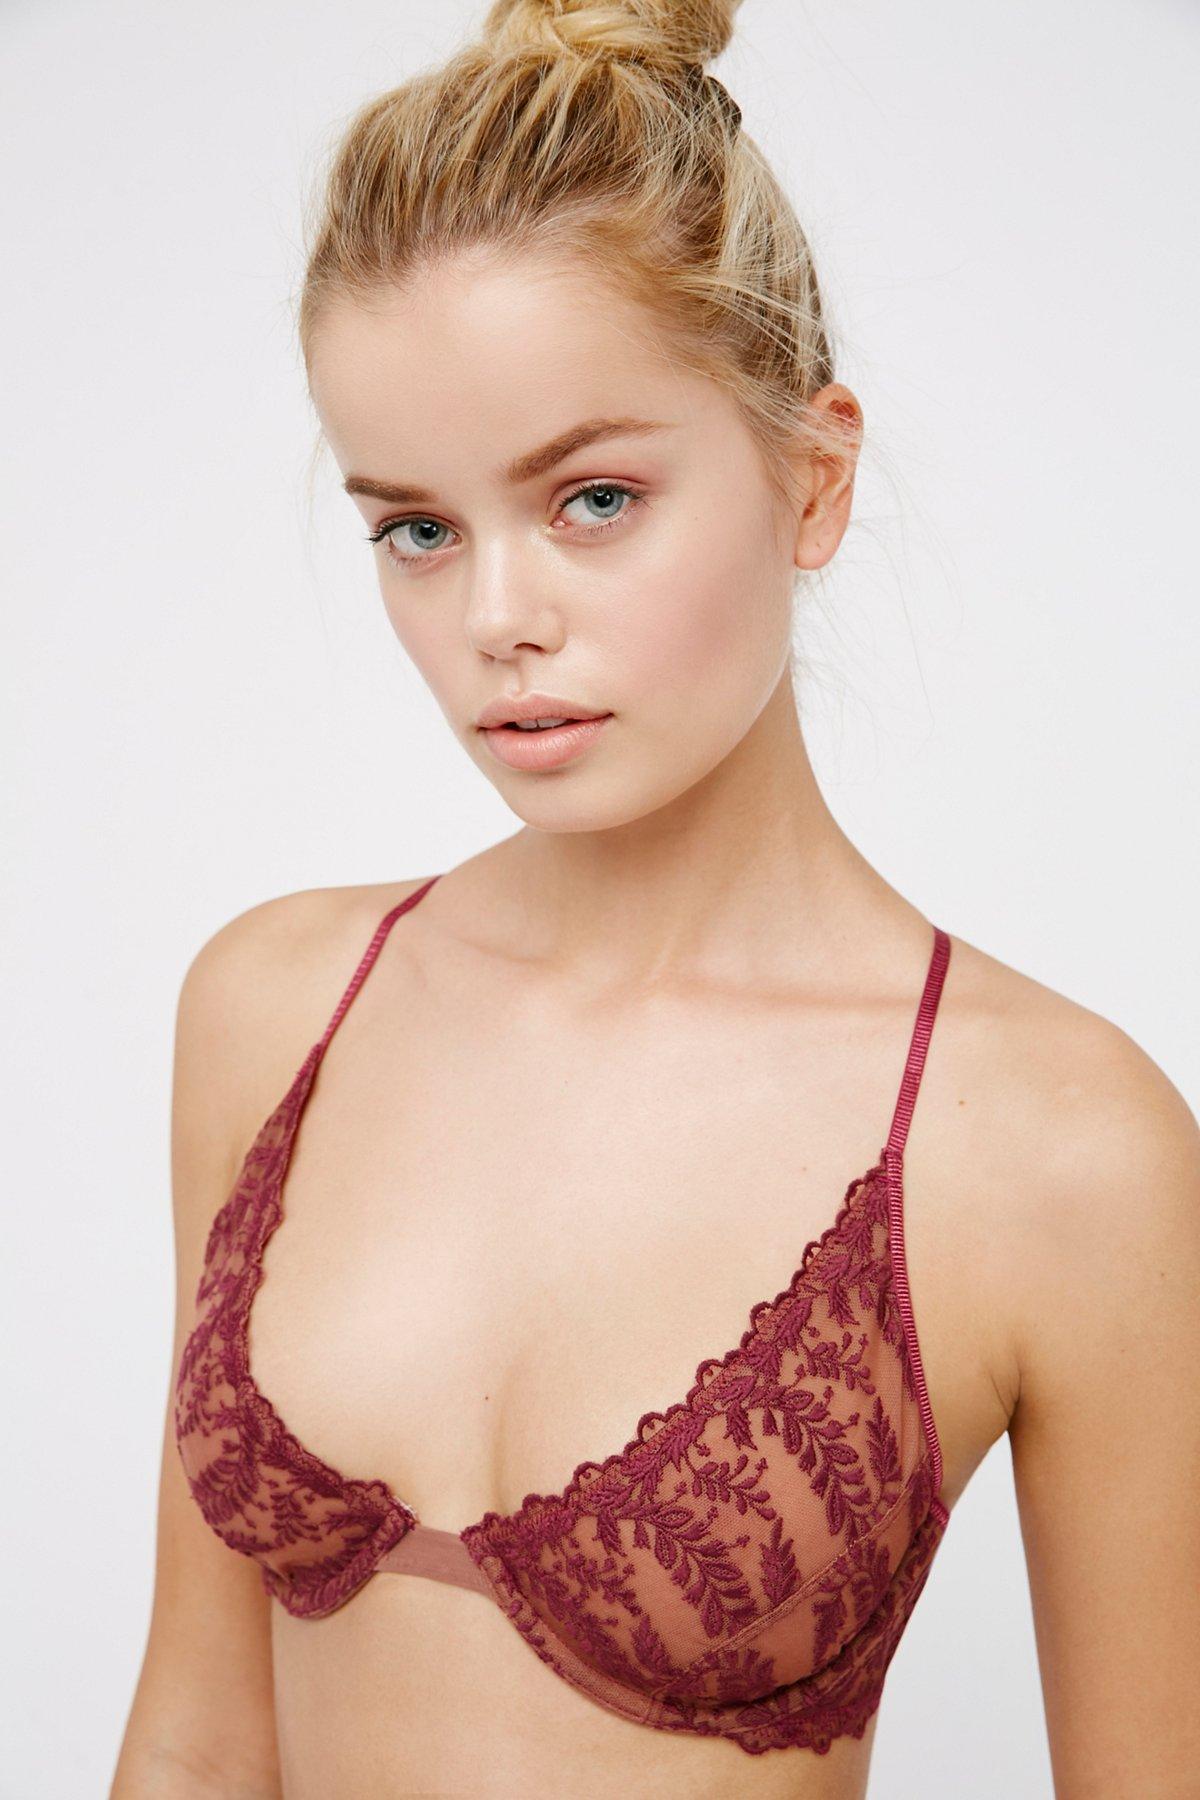 Crimson Clover钢托文胸